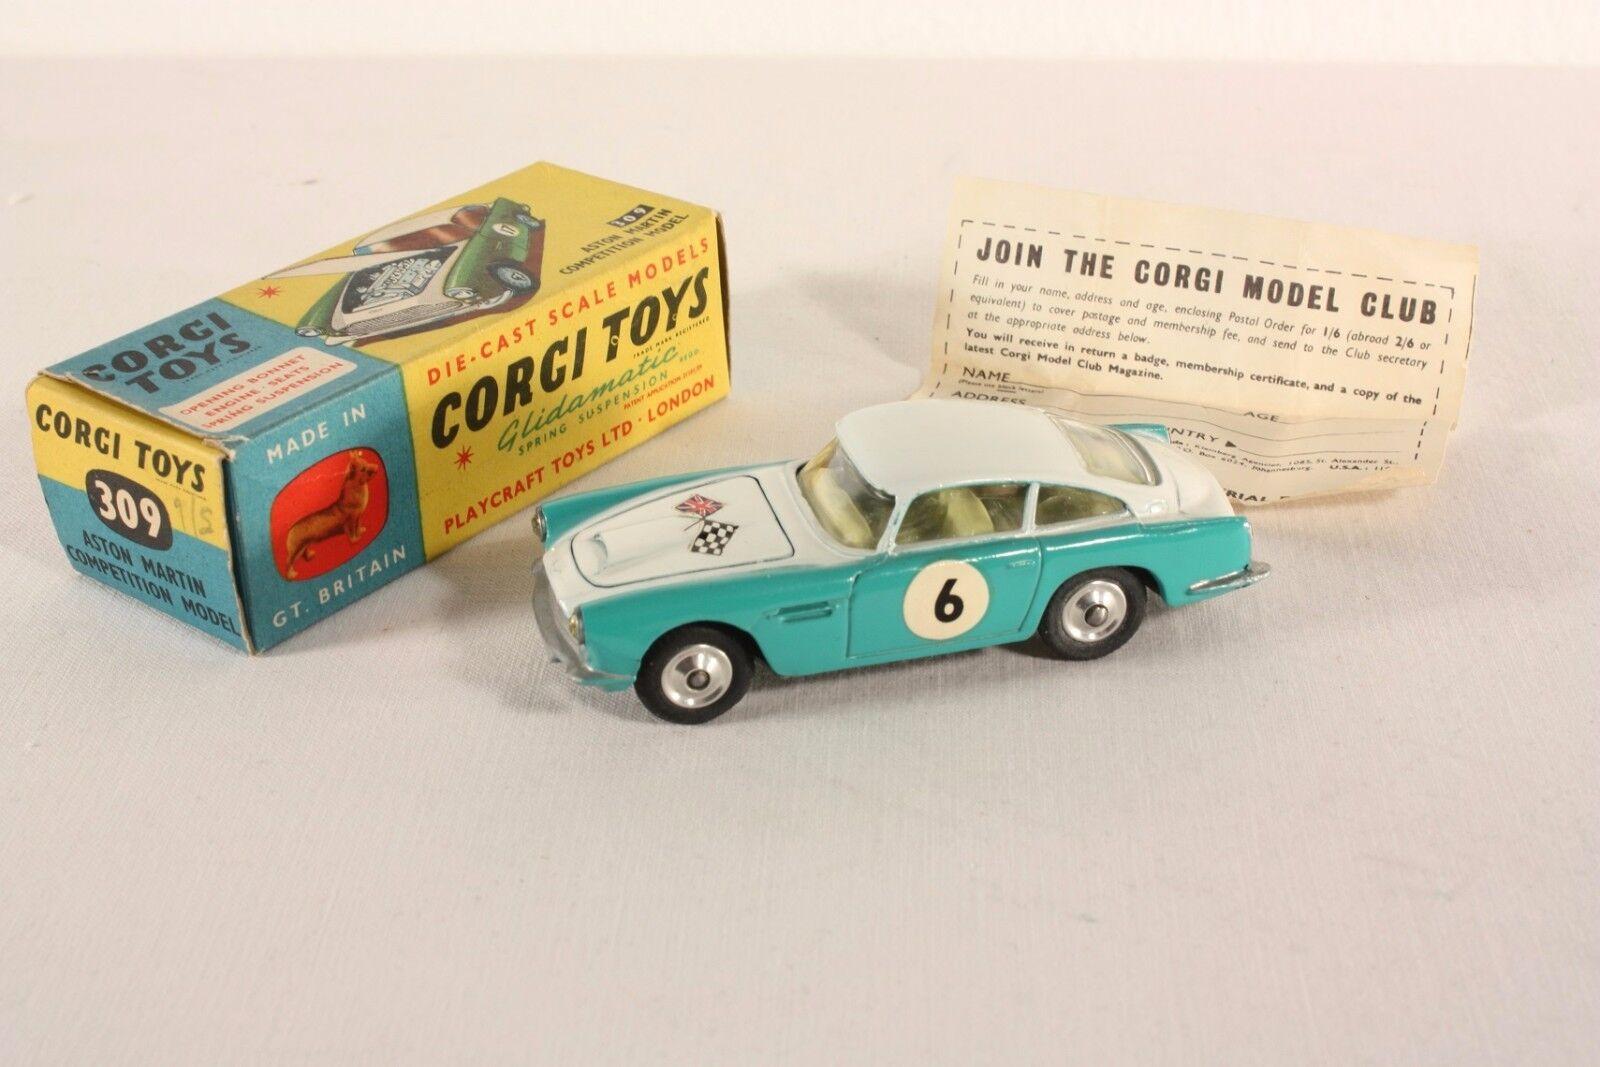 CORGI TOYS 309, Aston Martin Competition model, Rare No. 6, Comme neuf in box  ab970